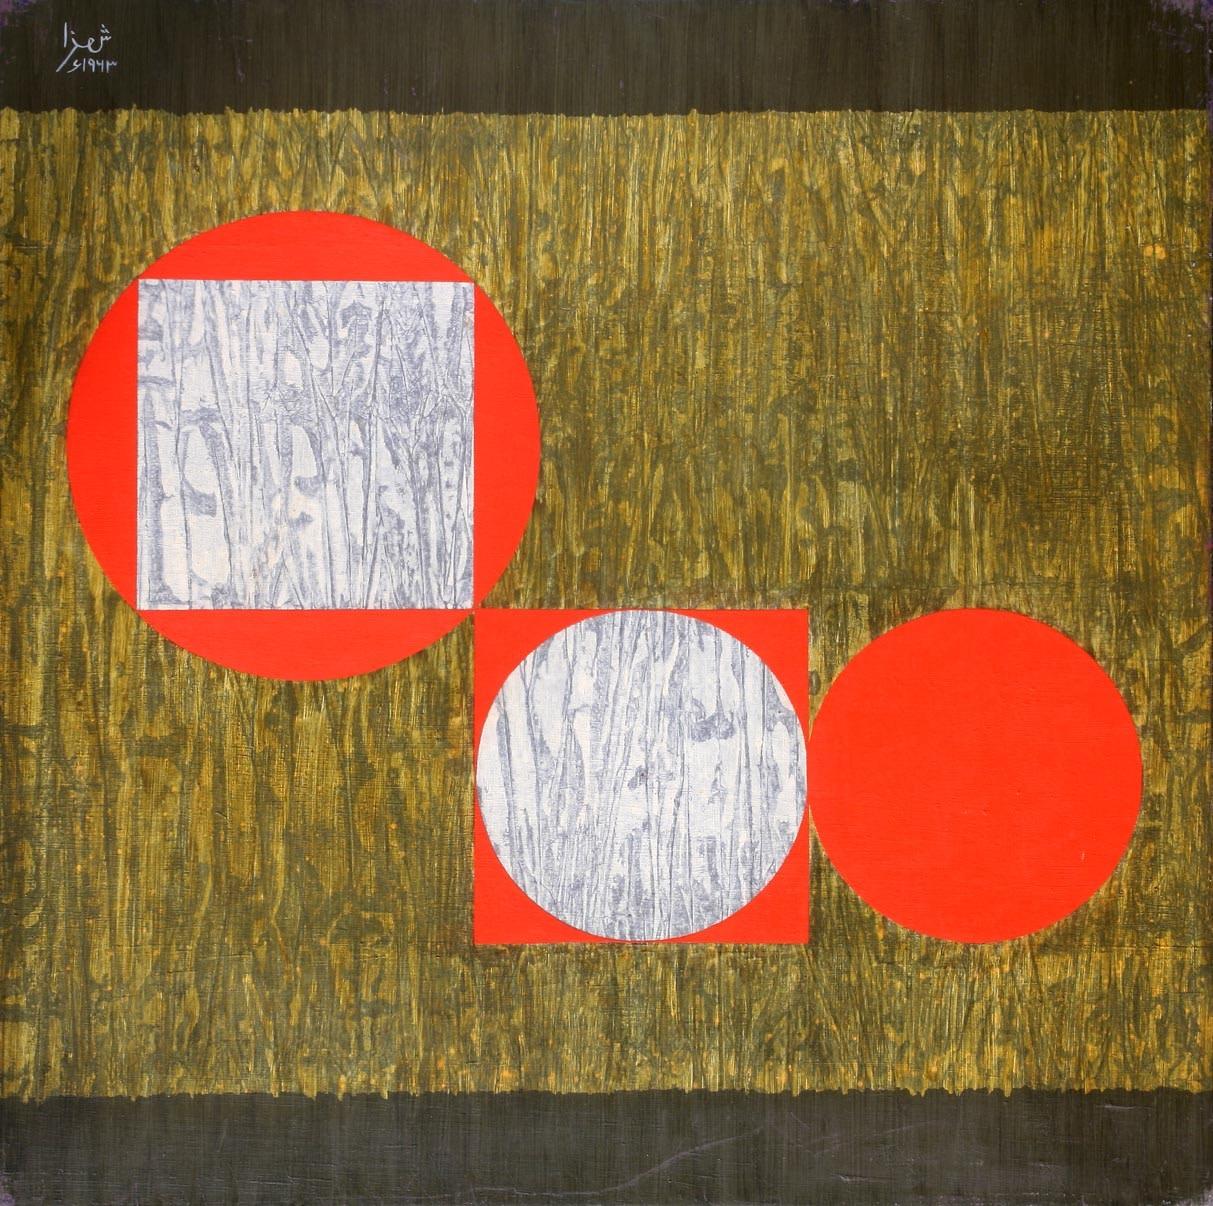 Anwar Jalal Shemza, Square Composition 10, 1963, Oil on hardboard, 61 x 61 cm, 24 1/8 x 24 1/8 in, Framed: 64.7 x 65 cm, 25 1/2 x 25 5/8 in